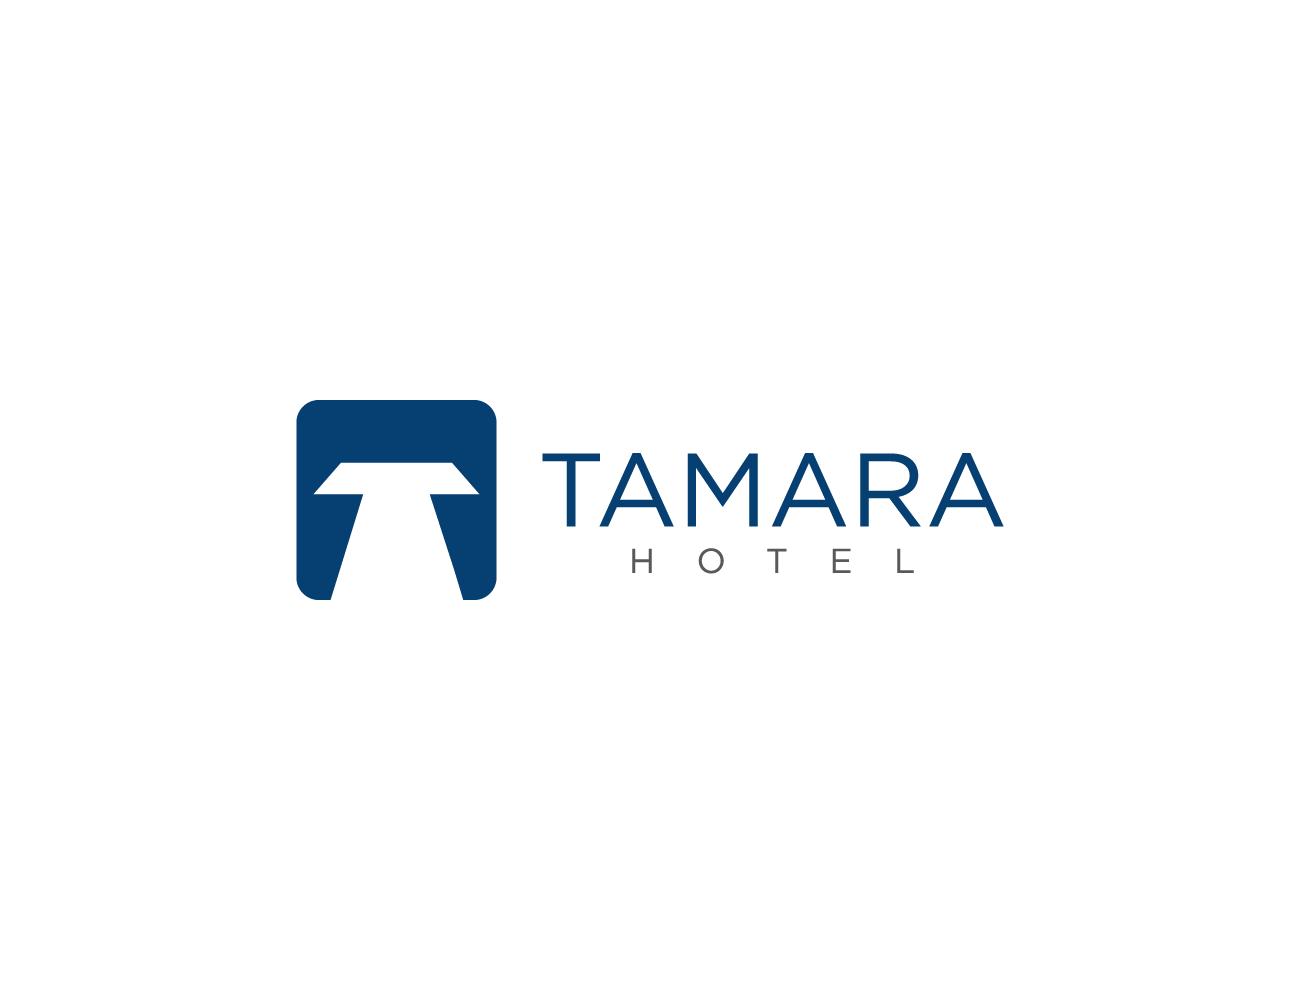 Hotel logo design for hotel tamara by en drow design for Hotel logo design